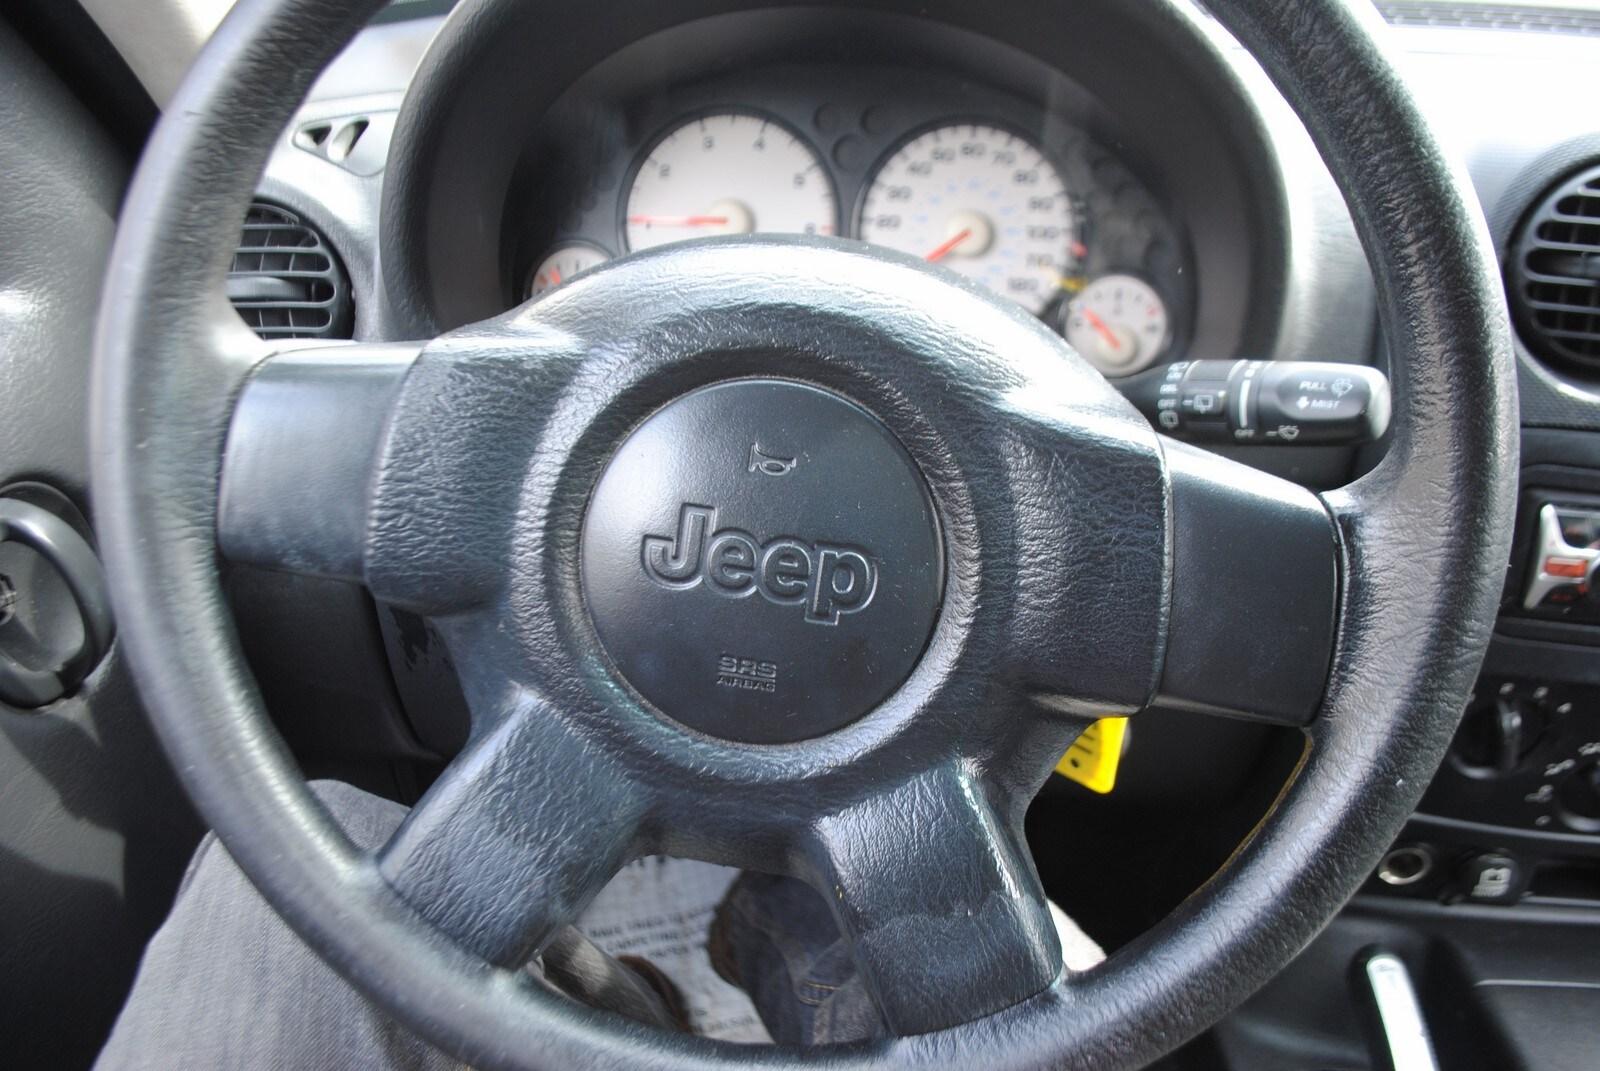 Jeep Liberty Rear Window Diagram Besides Jeep Liberty Tailgate Parts